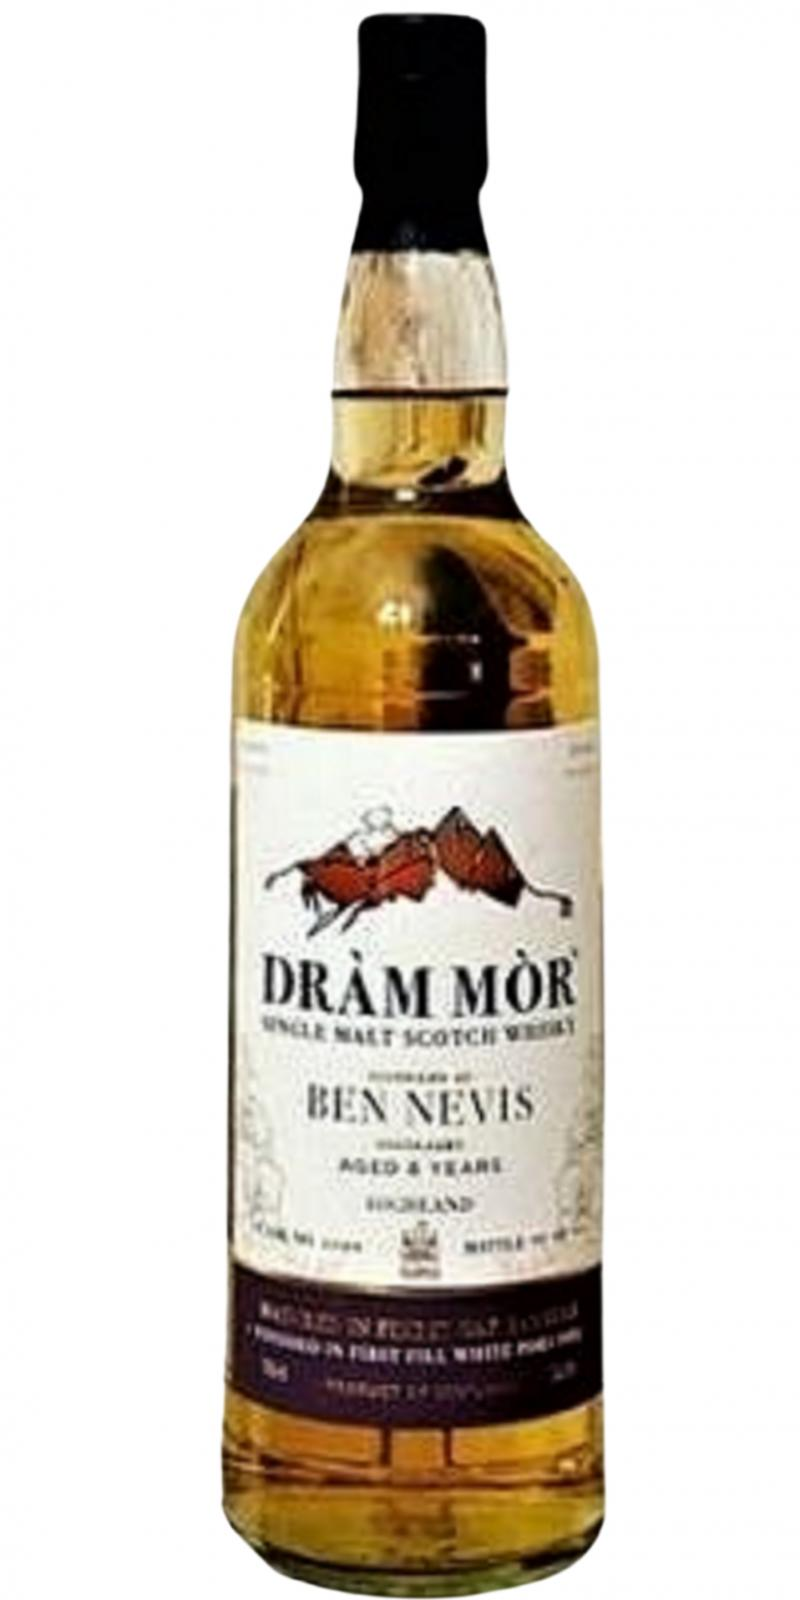 Ben Nevis 2012 DMor